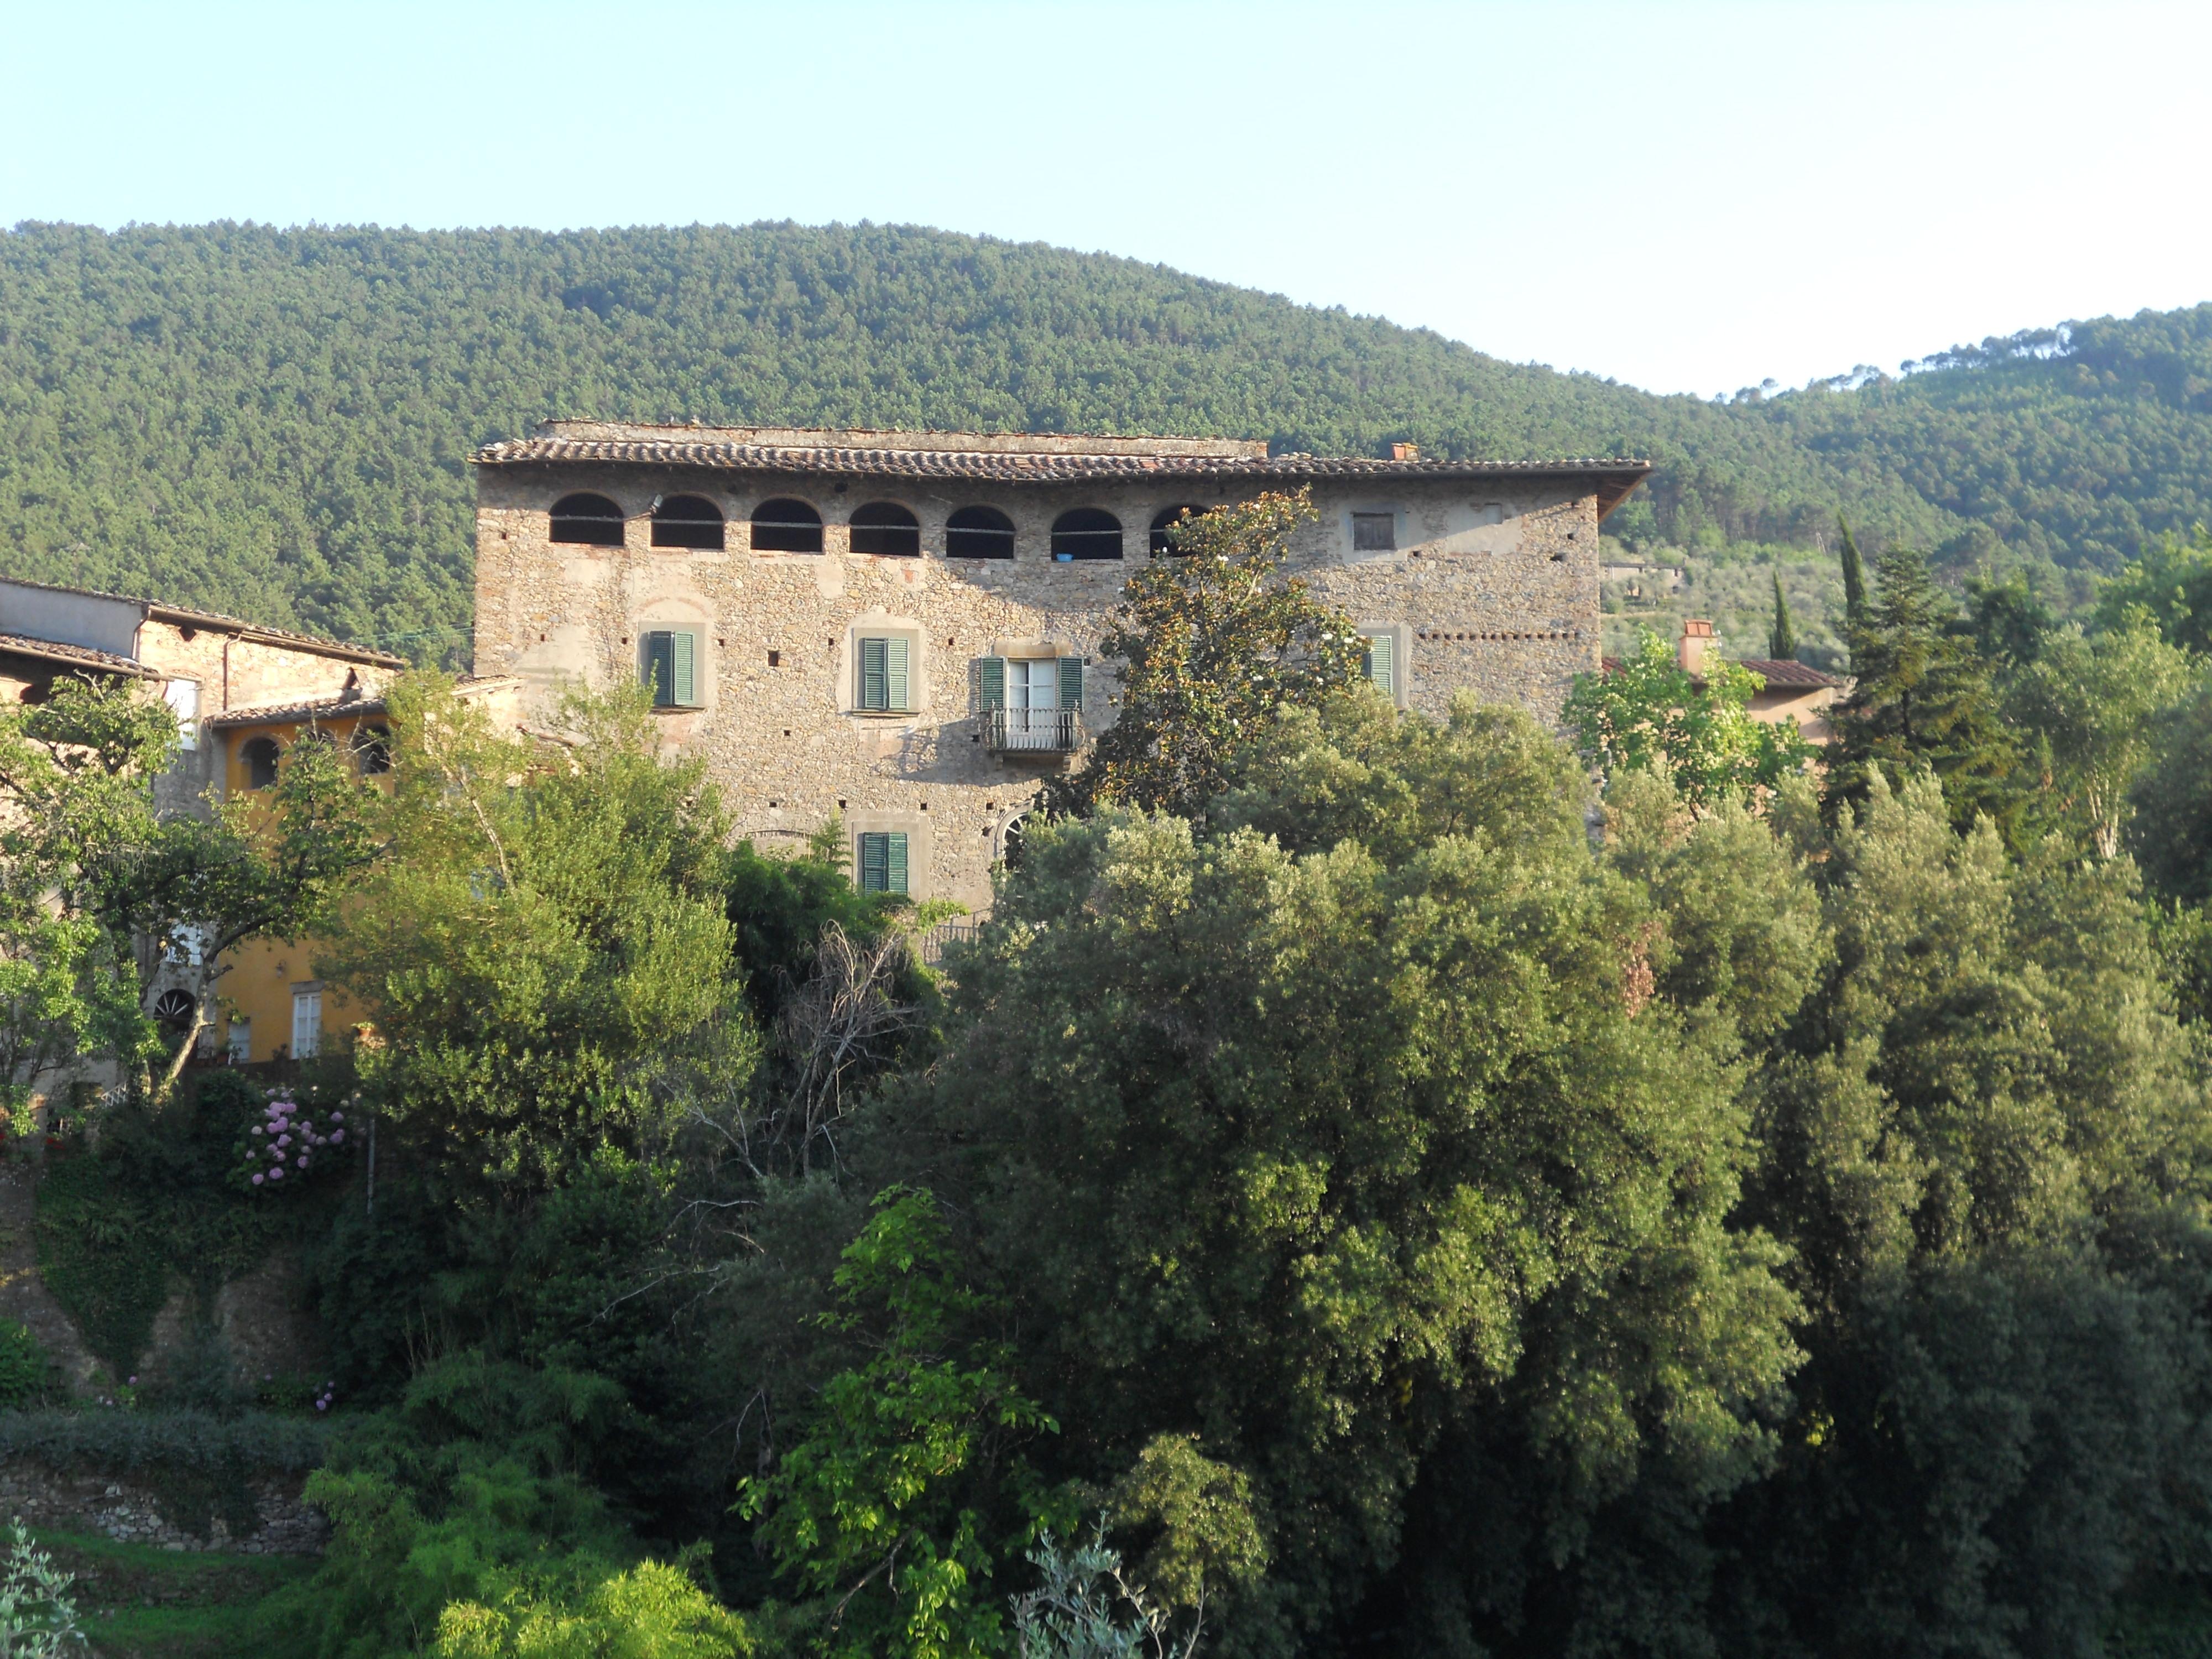 Villa medicea di Buti - Wikiwand